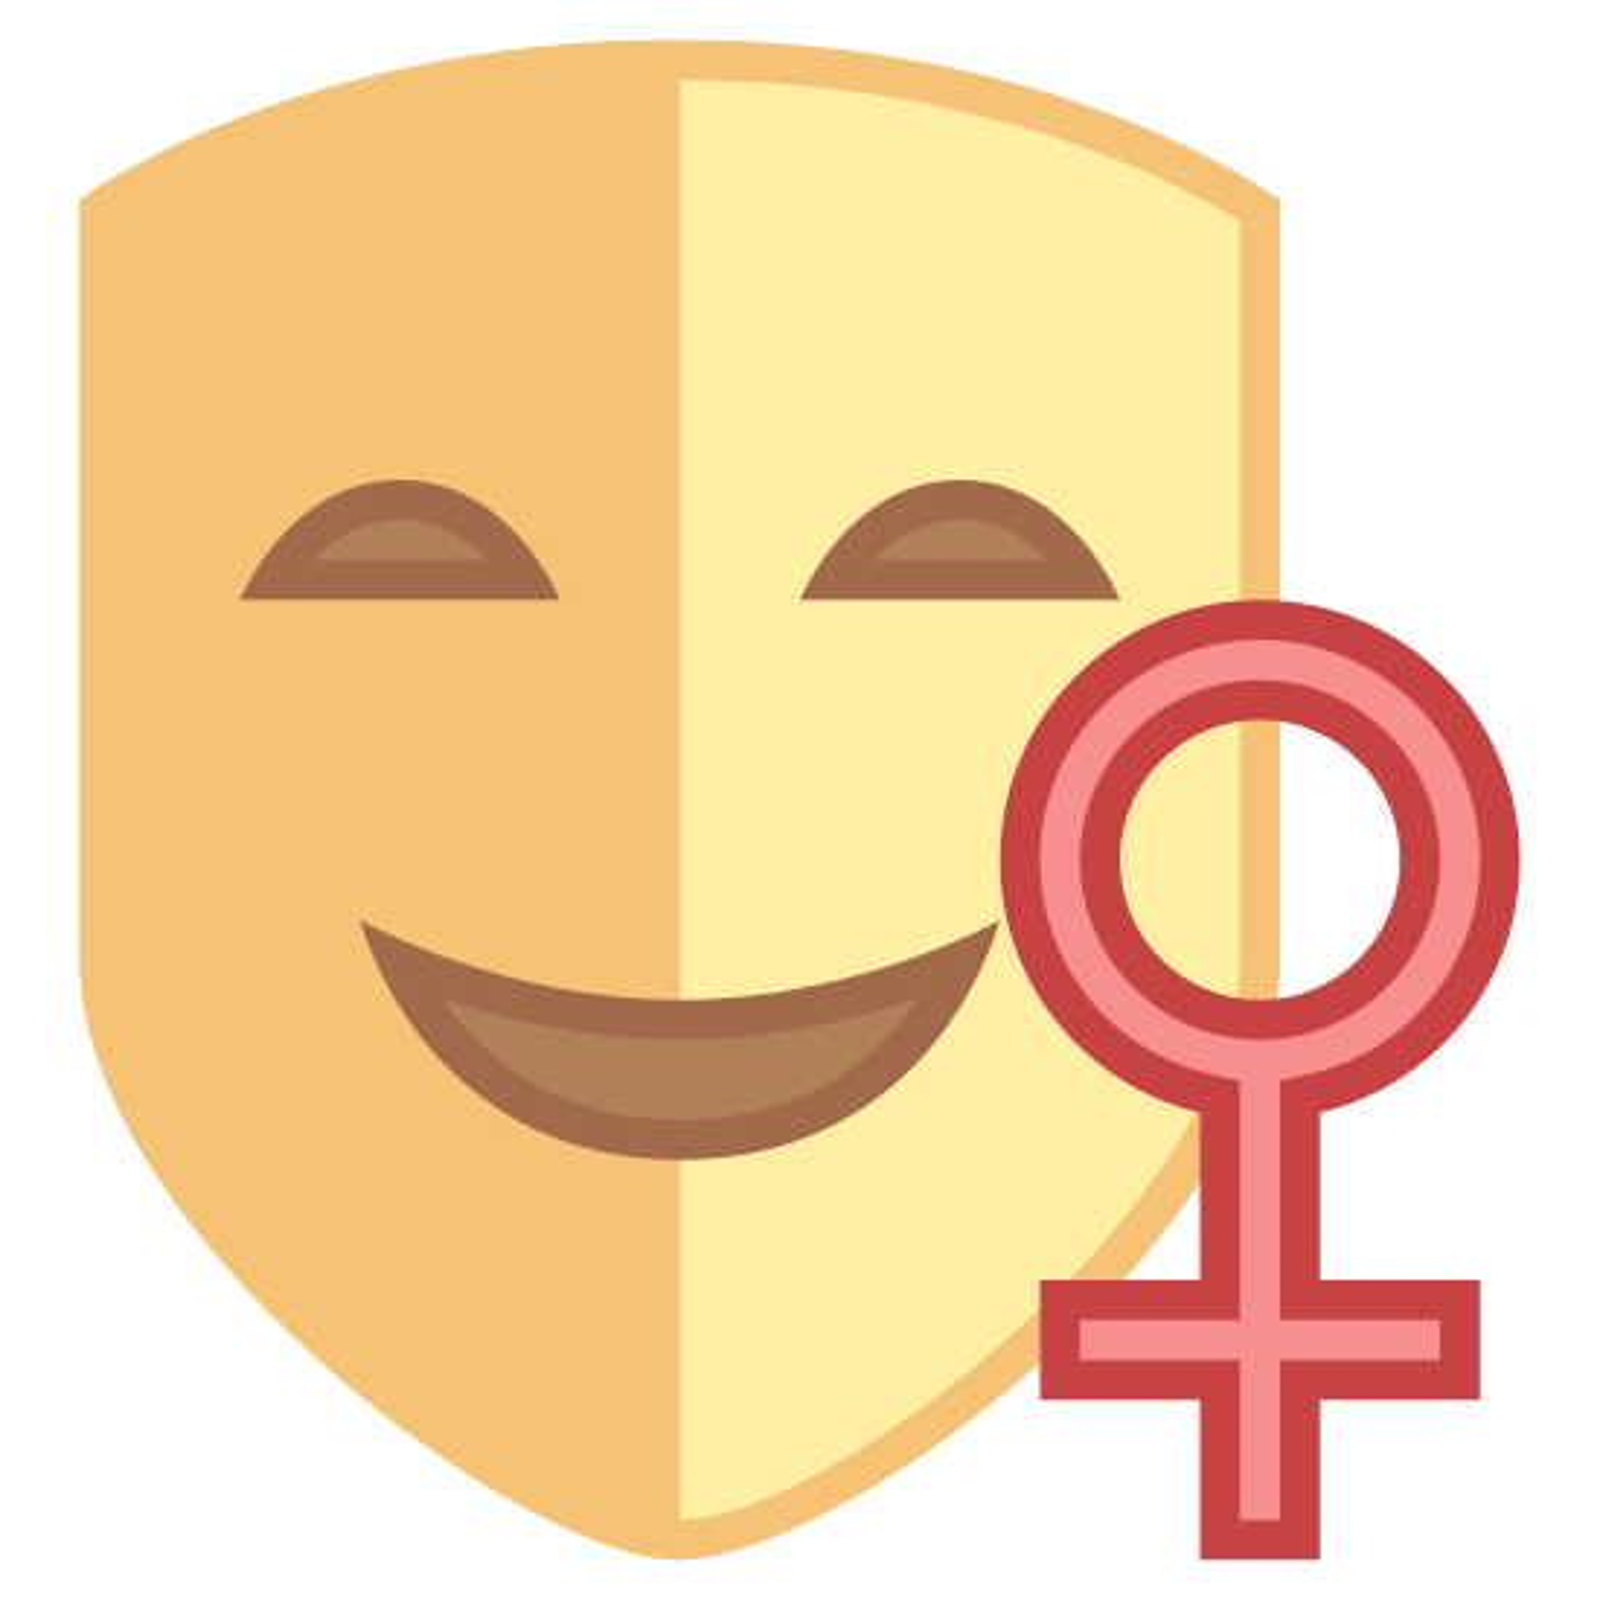 Aktorki icon